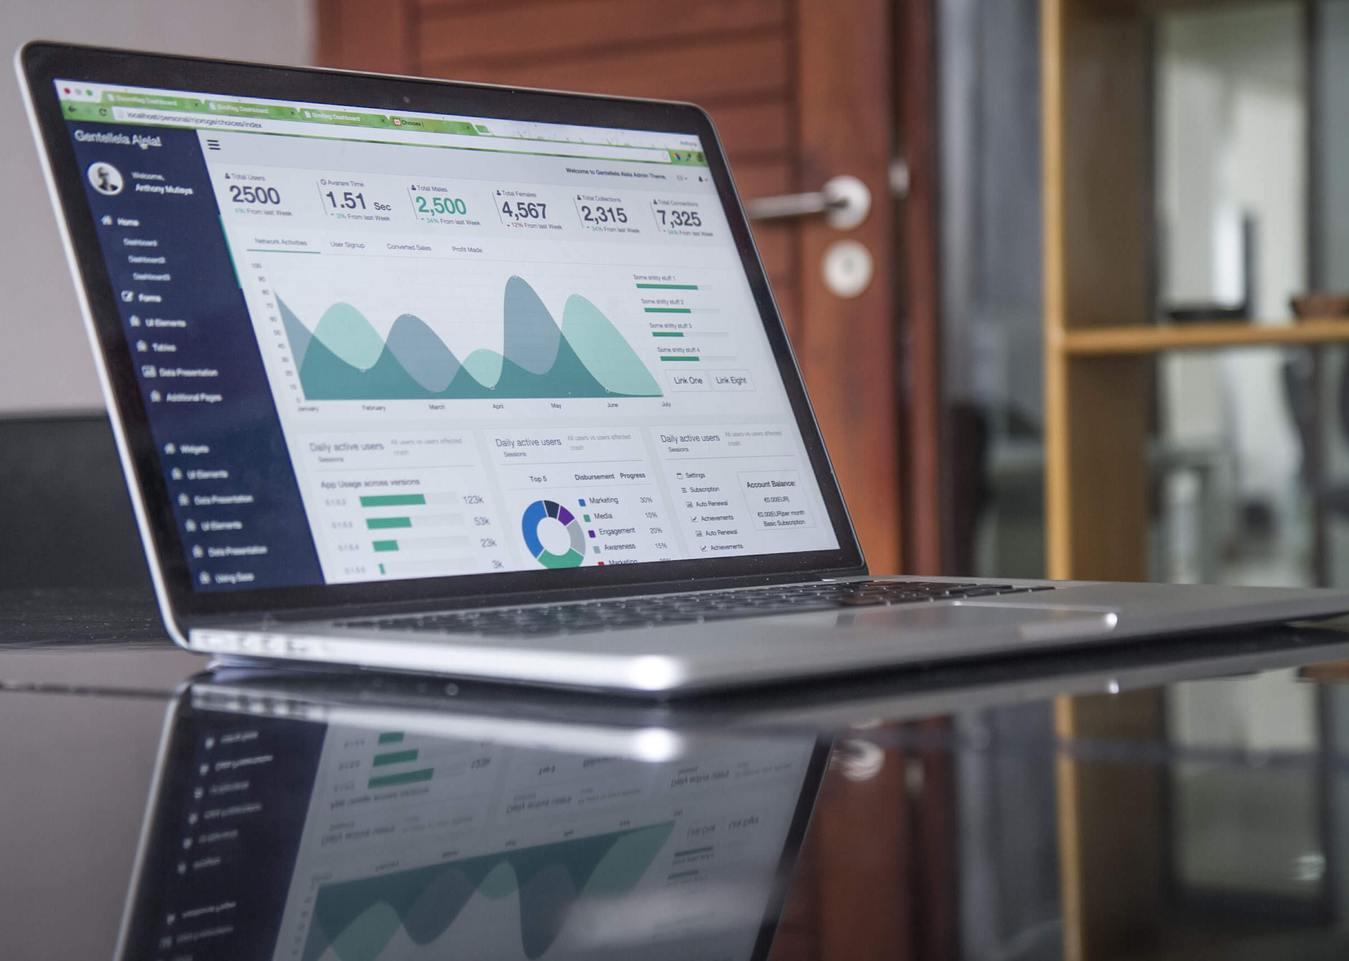 Optimization graphs on laptop